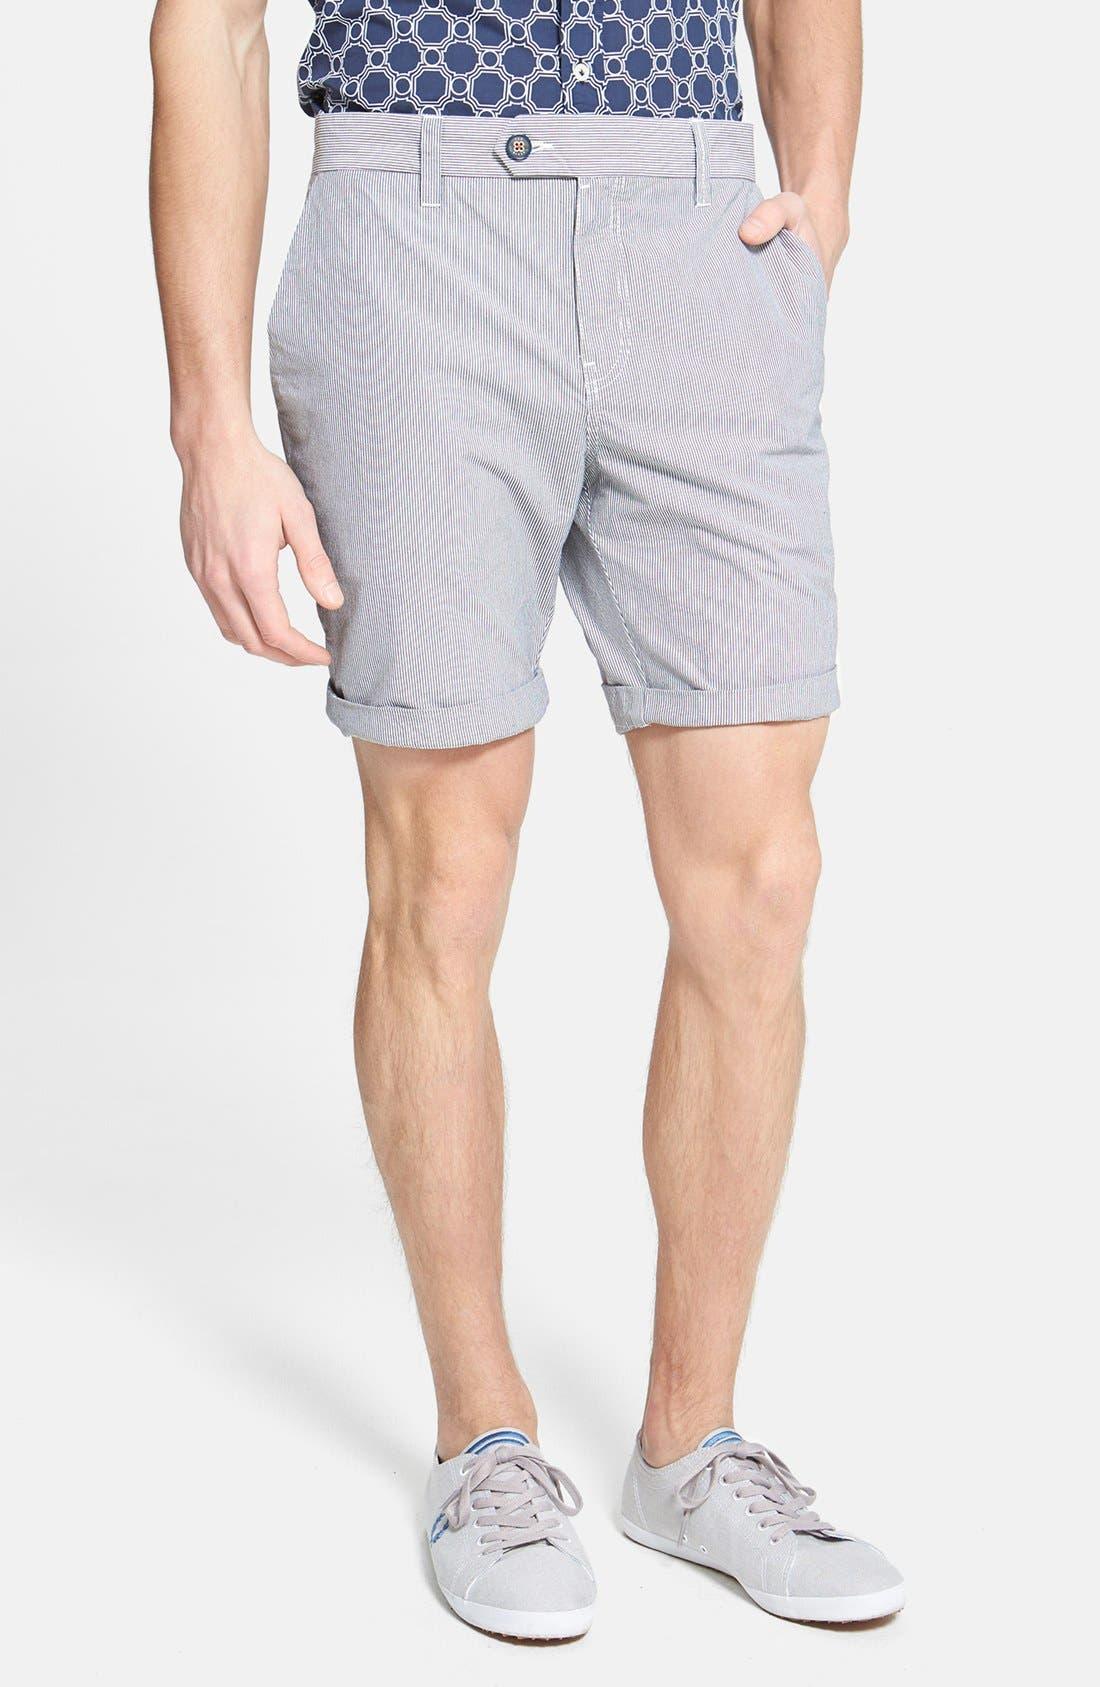 Alternate Image 1 Selected - Ted Baker London 'Staddle' Slim Fit Stripe Shorts